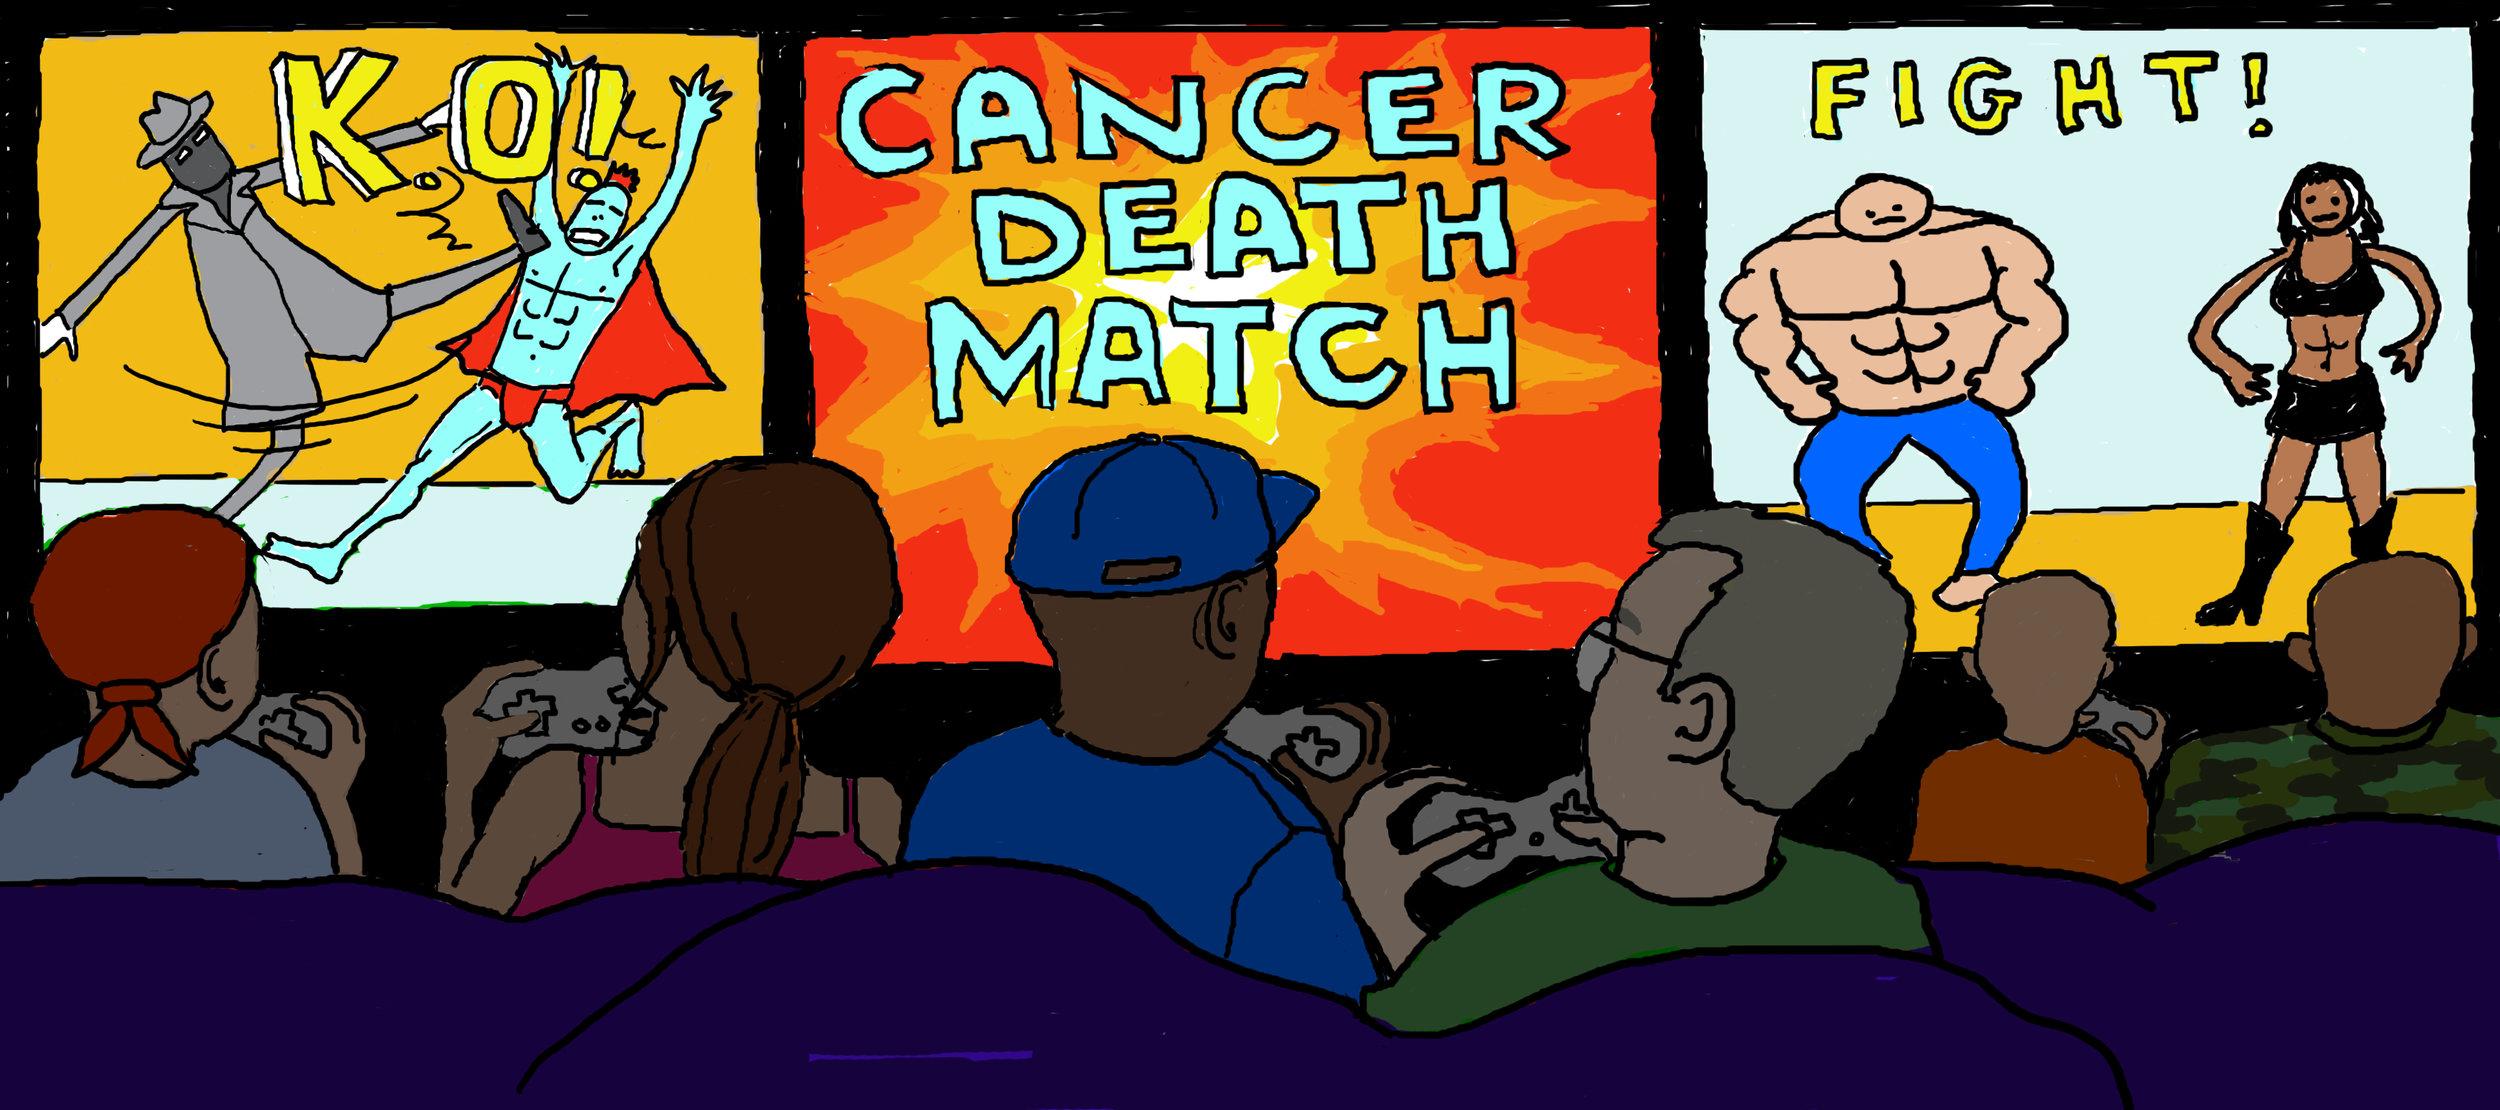 Cancer Death Match -